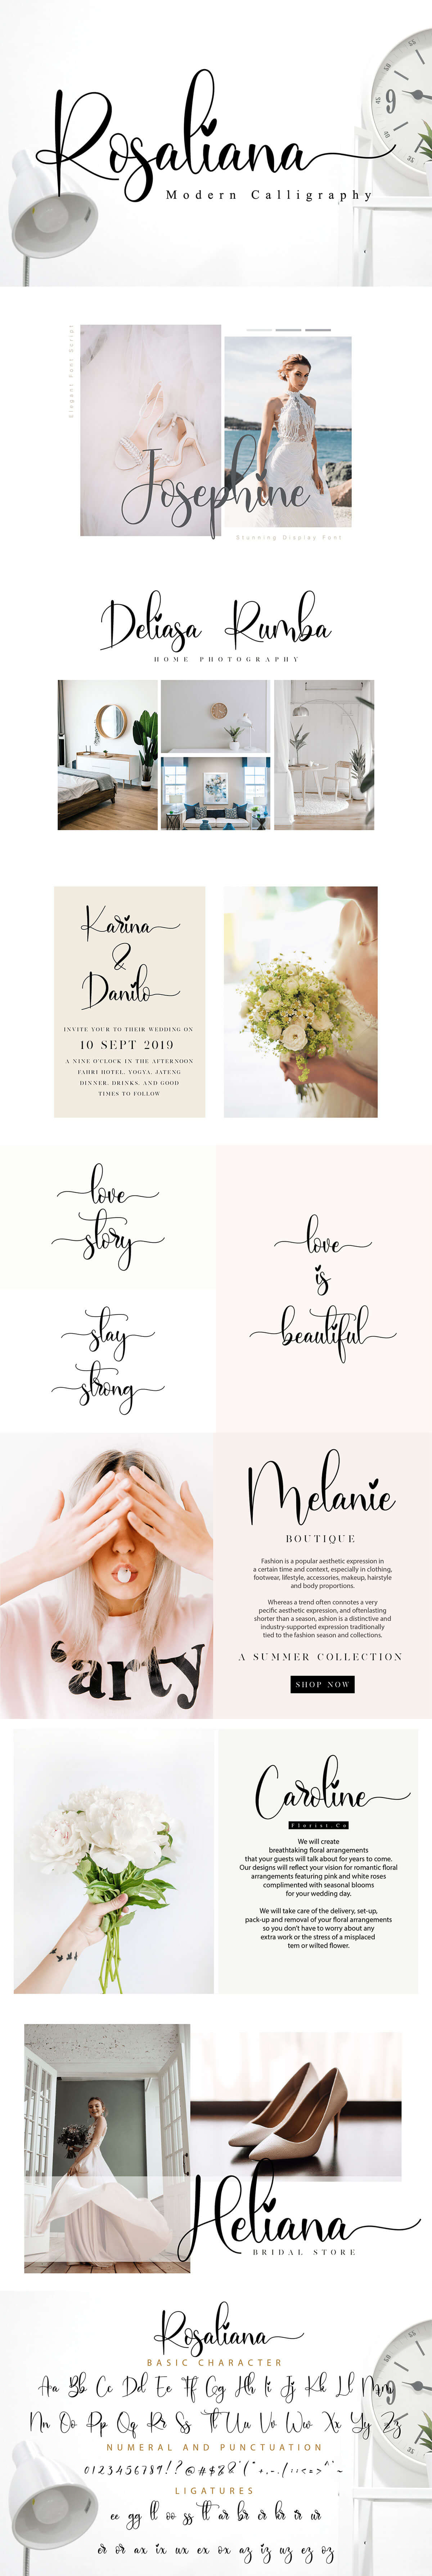 Free Rosaliana Calligraphy Font